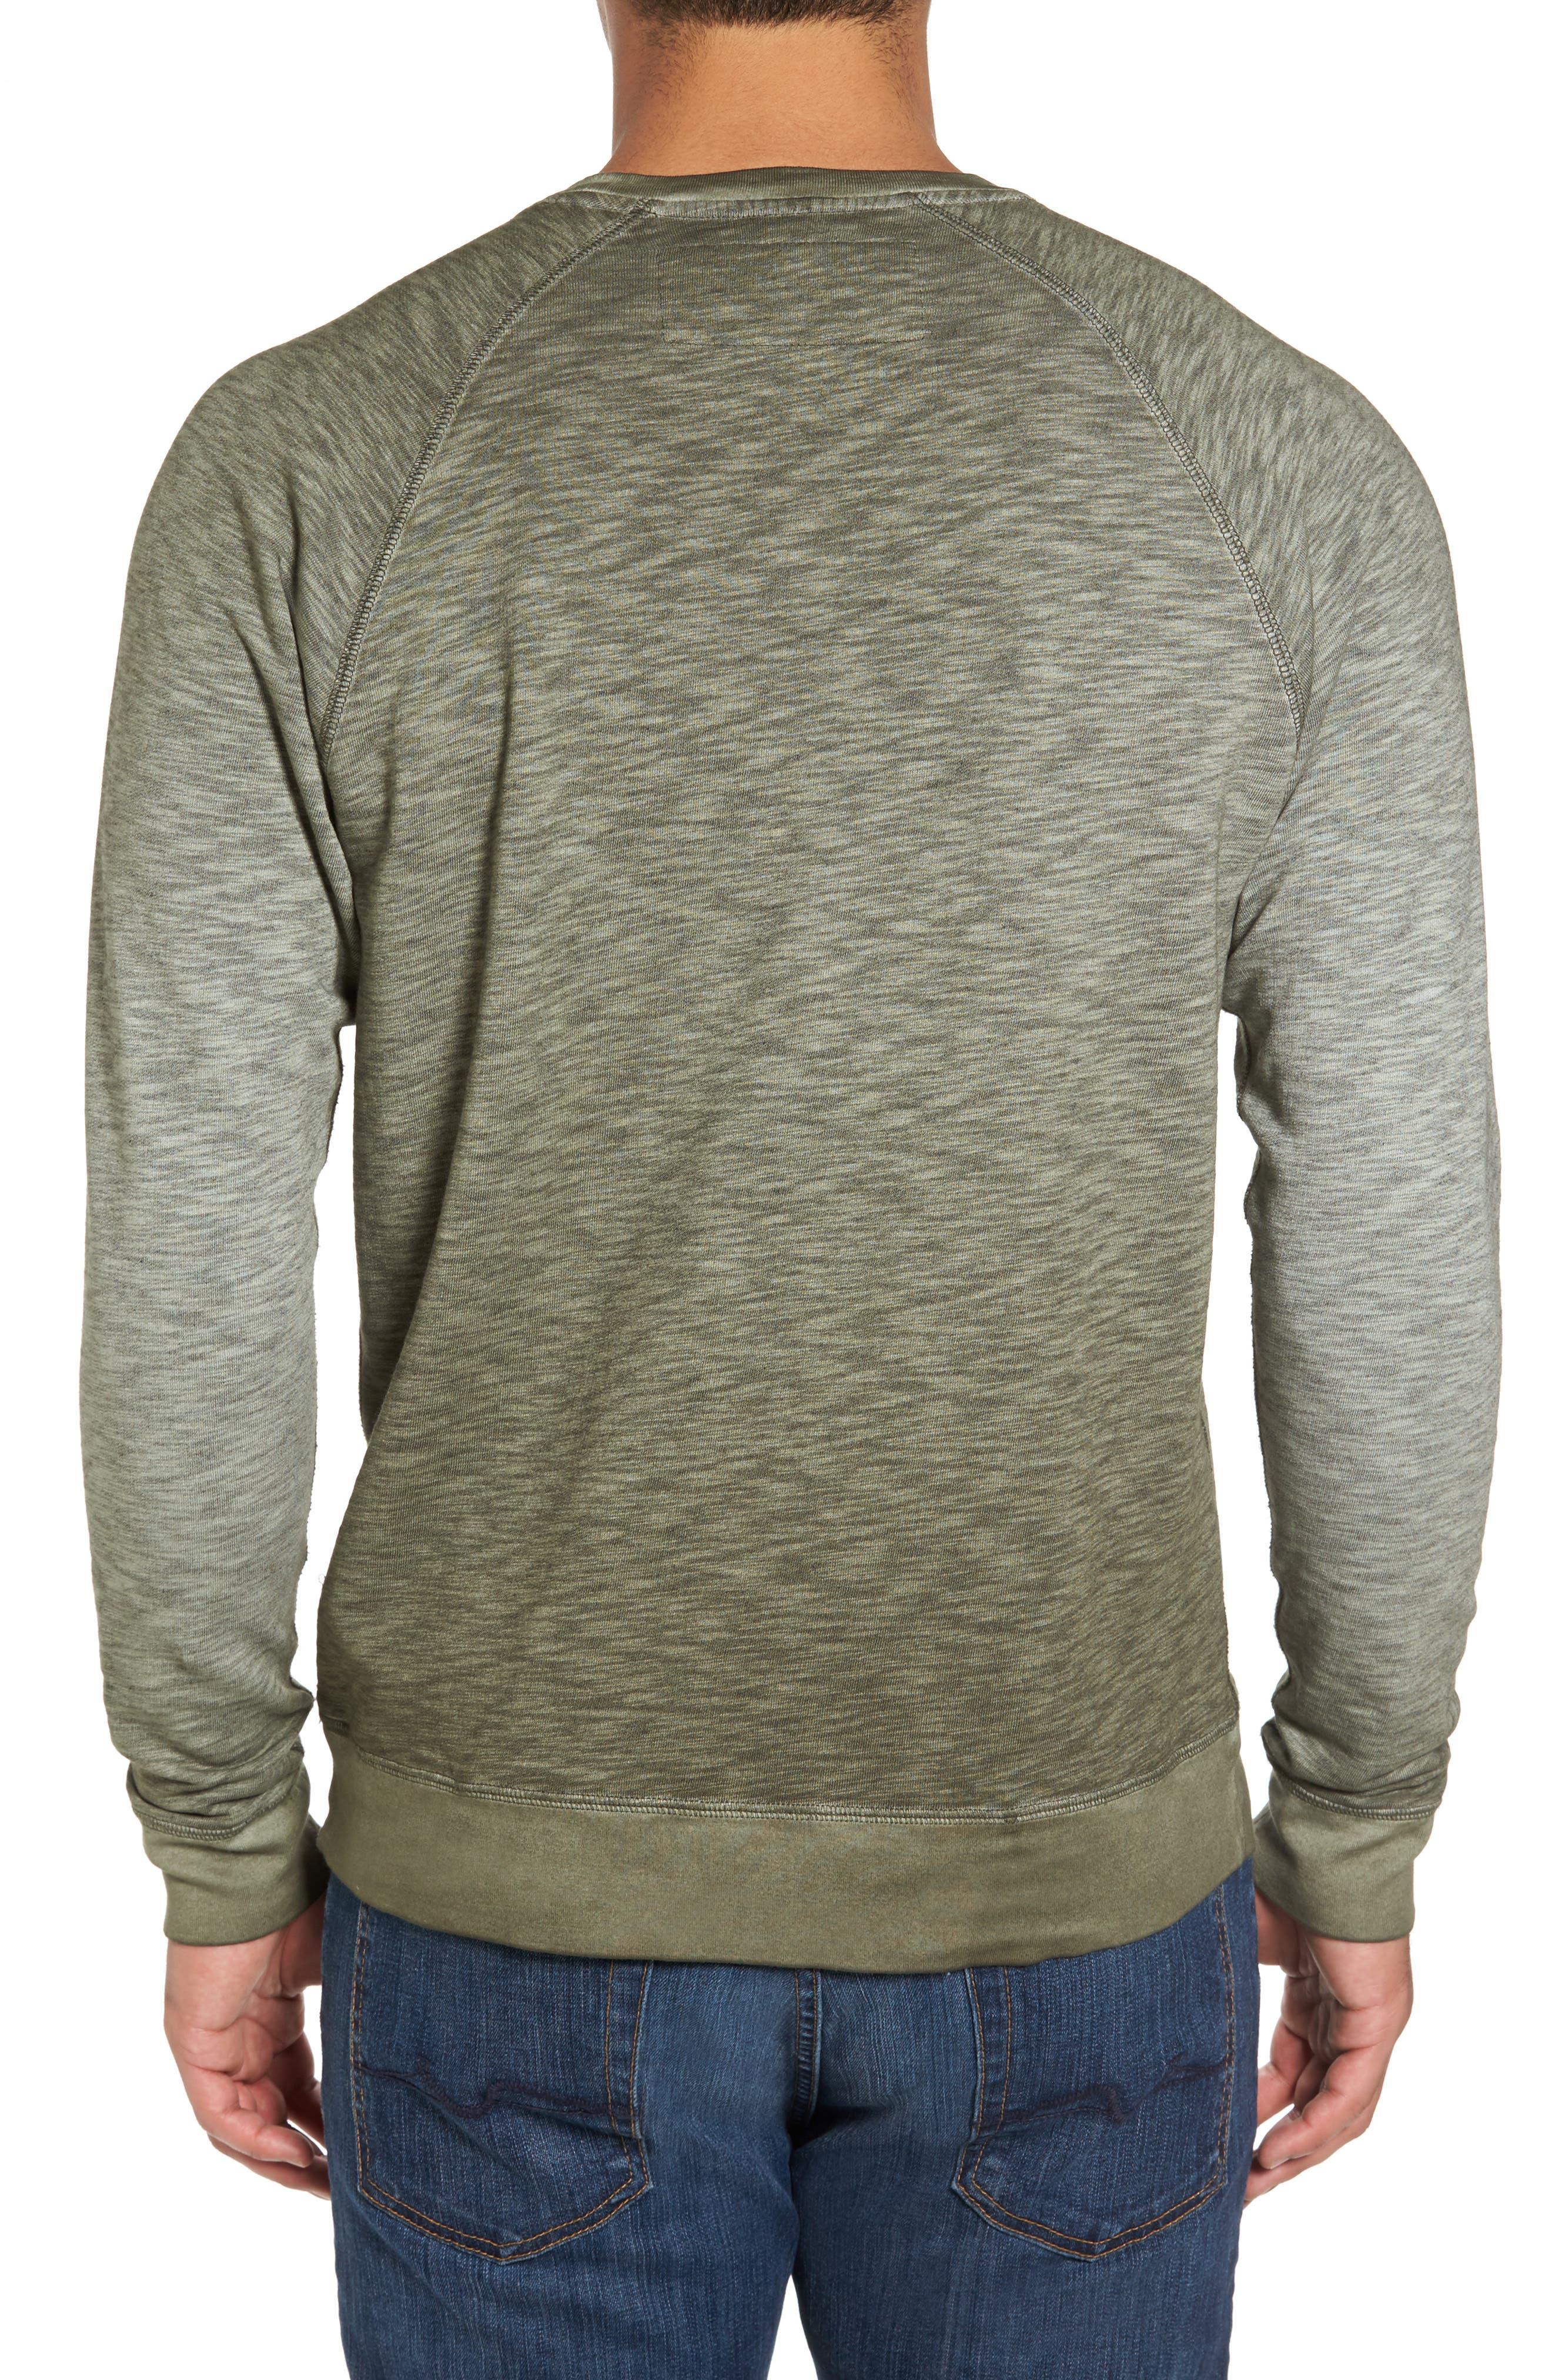 Alternate Image 2  - Tommy Bahama 'Santiago' Ombré Crewneck Sweatshirt